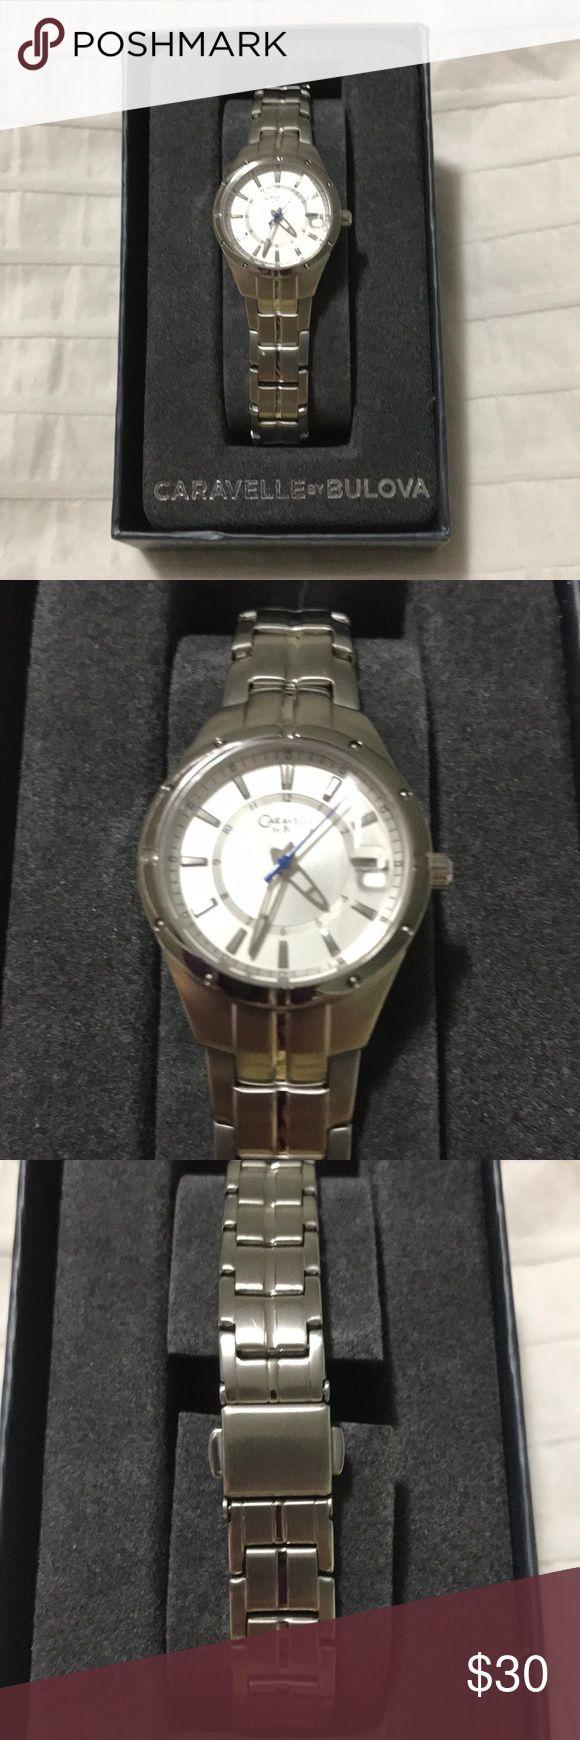 Women's silver watch Women's silver Caravelle by Bulova watch with clasp Jewelry Bracelets